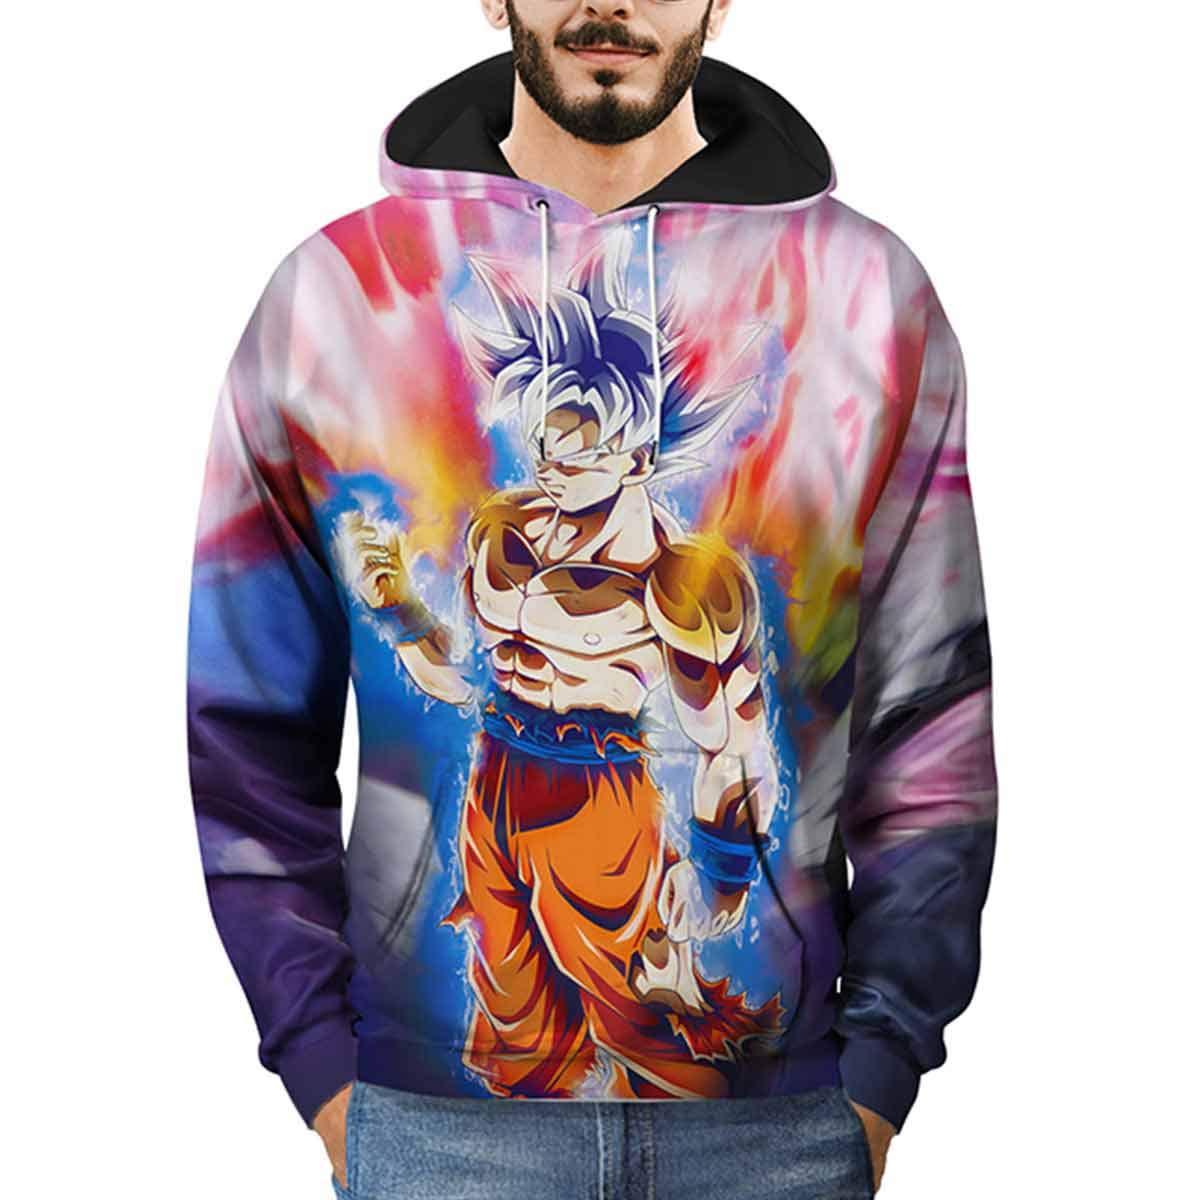 Dragon Ball Z Hooded Sweatshirt Mens Manga Larga Pullover Hoodie Streetwear: Amazon.es: Ropa y accesorios